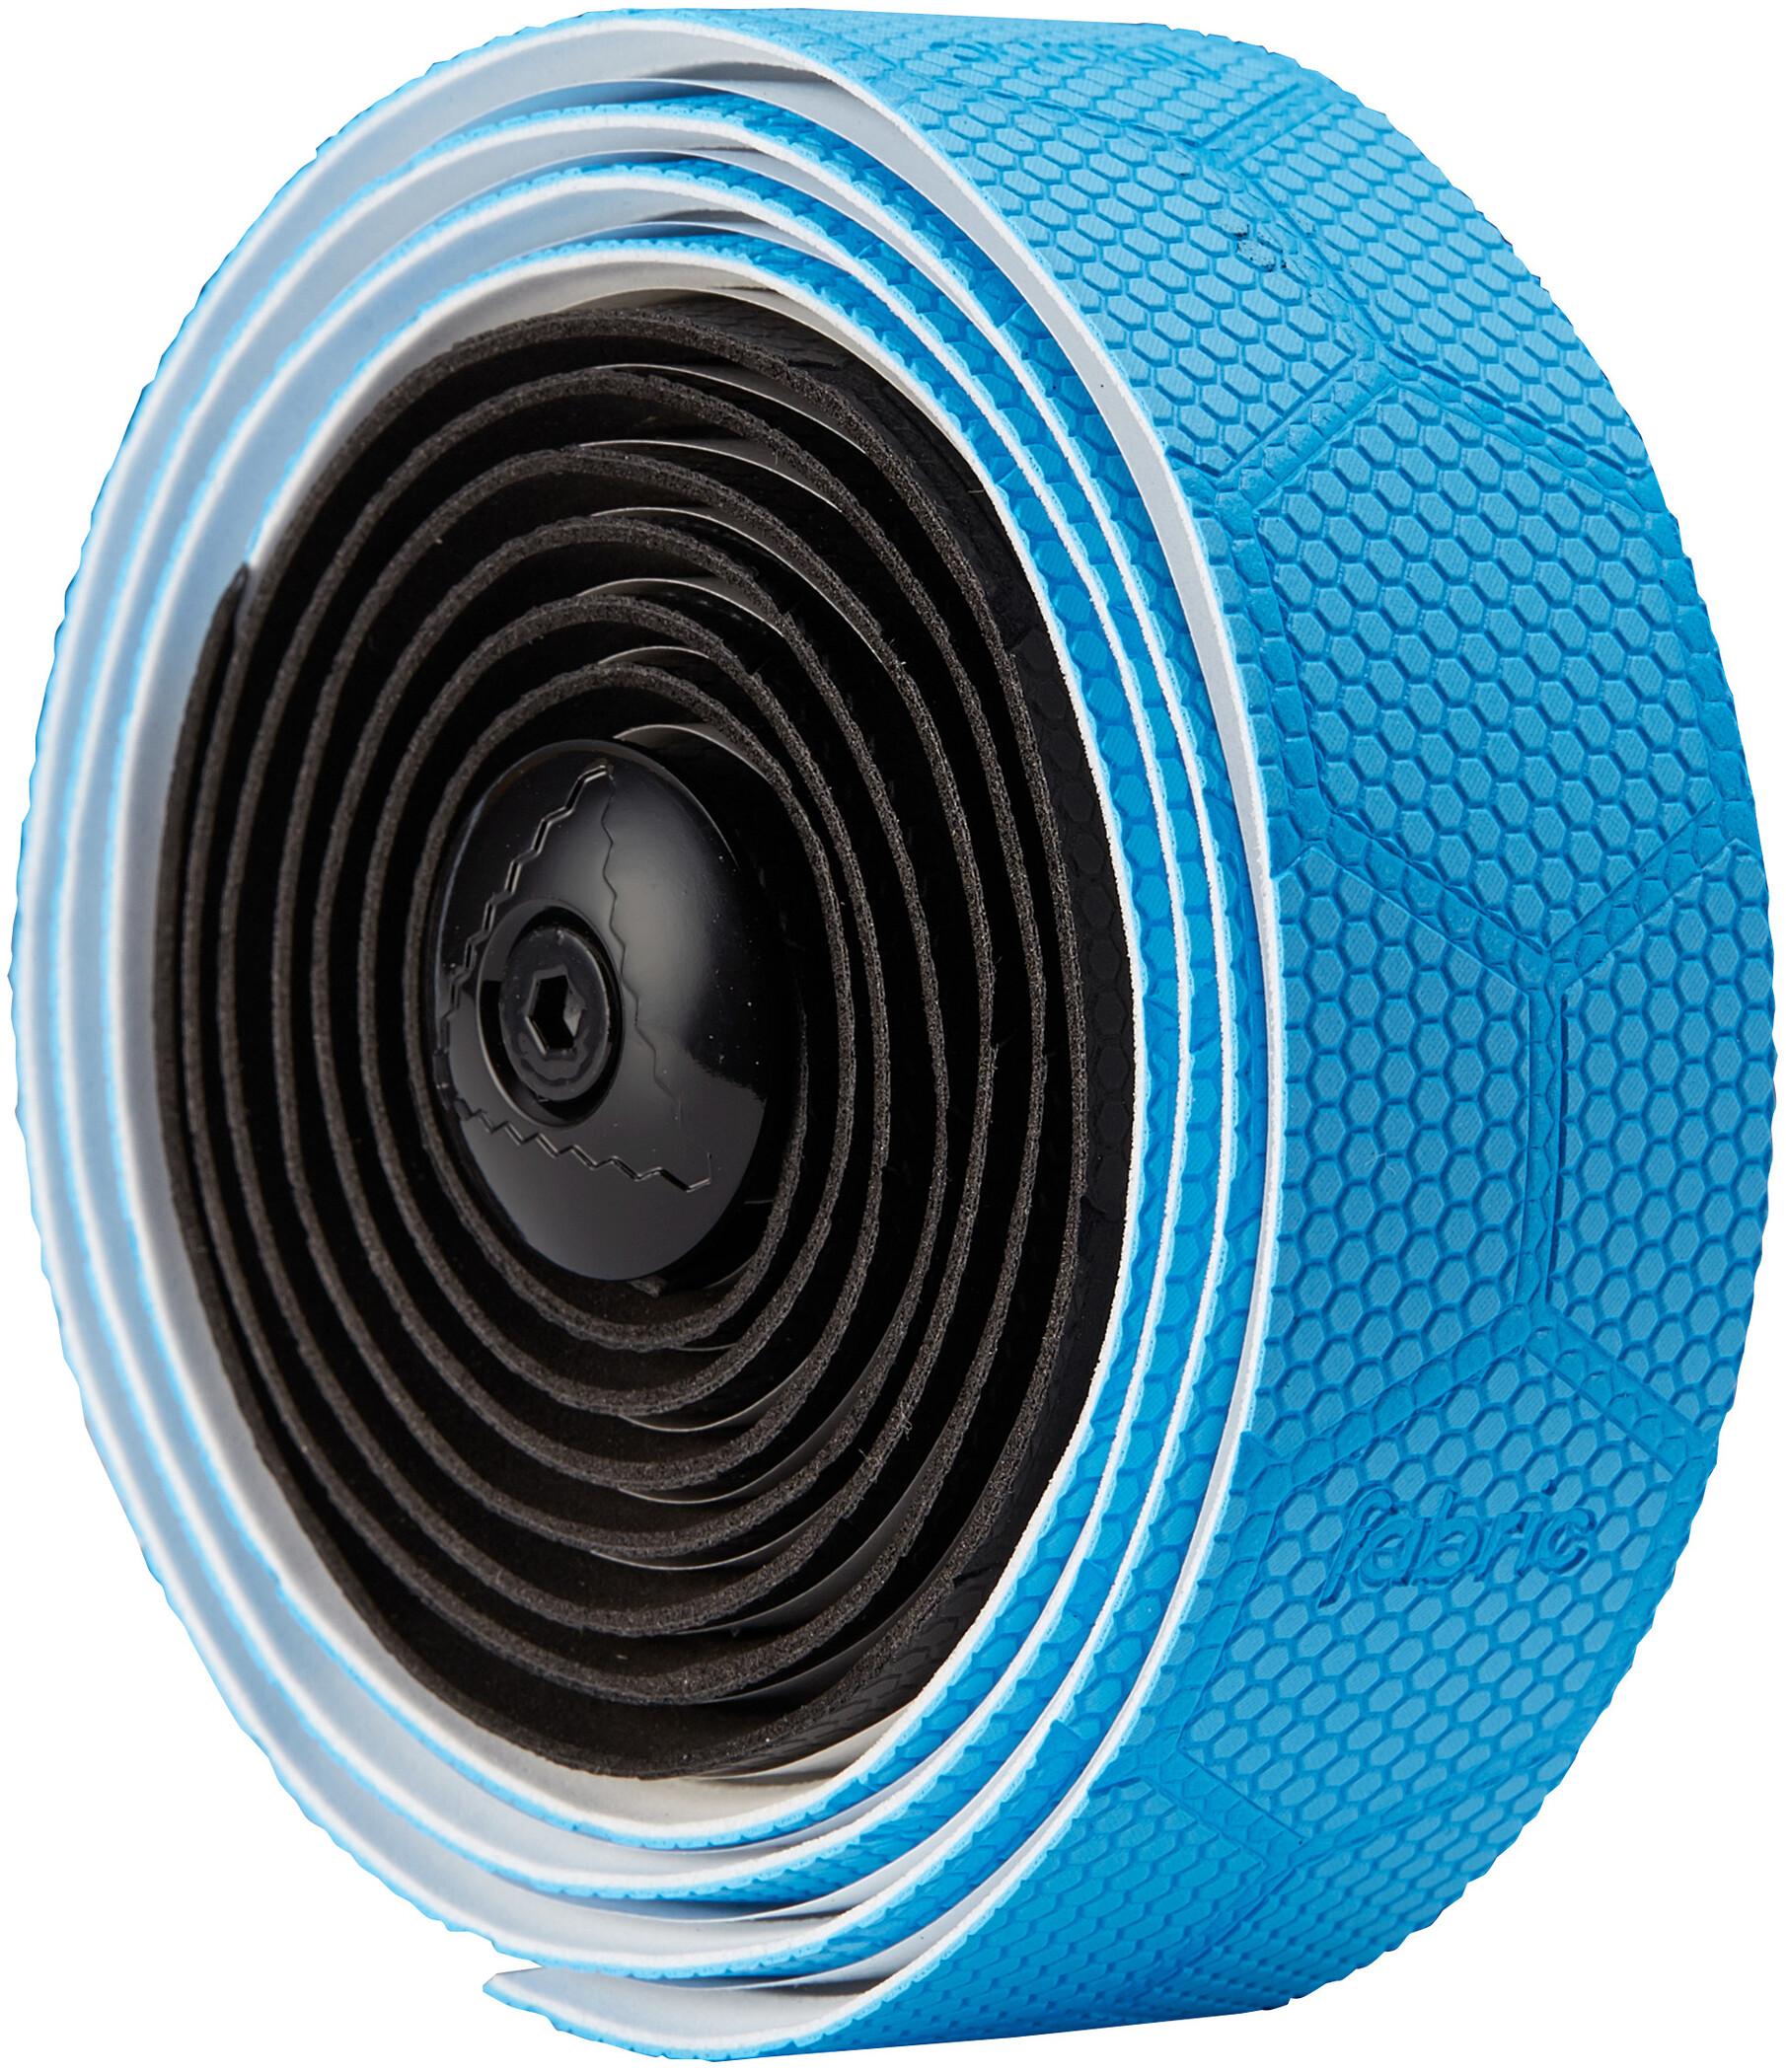 Fabric Hex Duo Styrbånd, black/blue (2019) | Bar tape